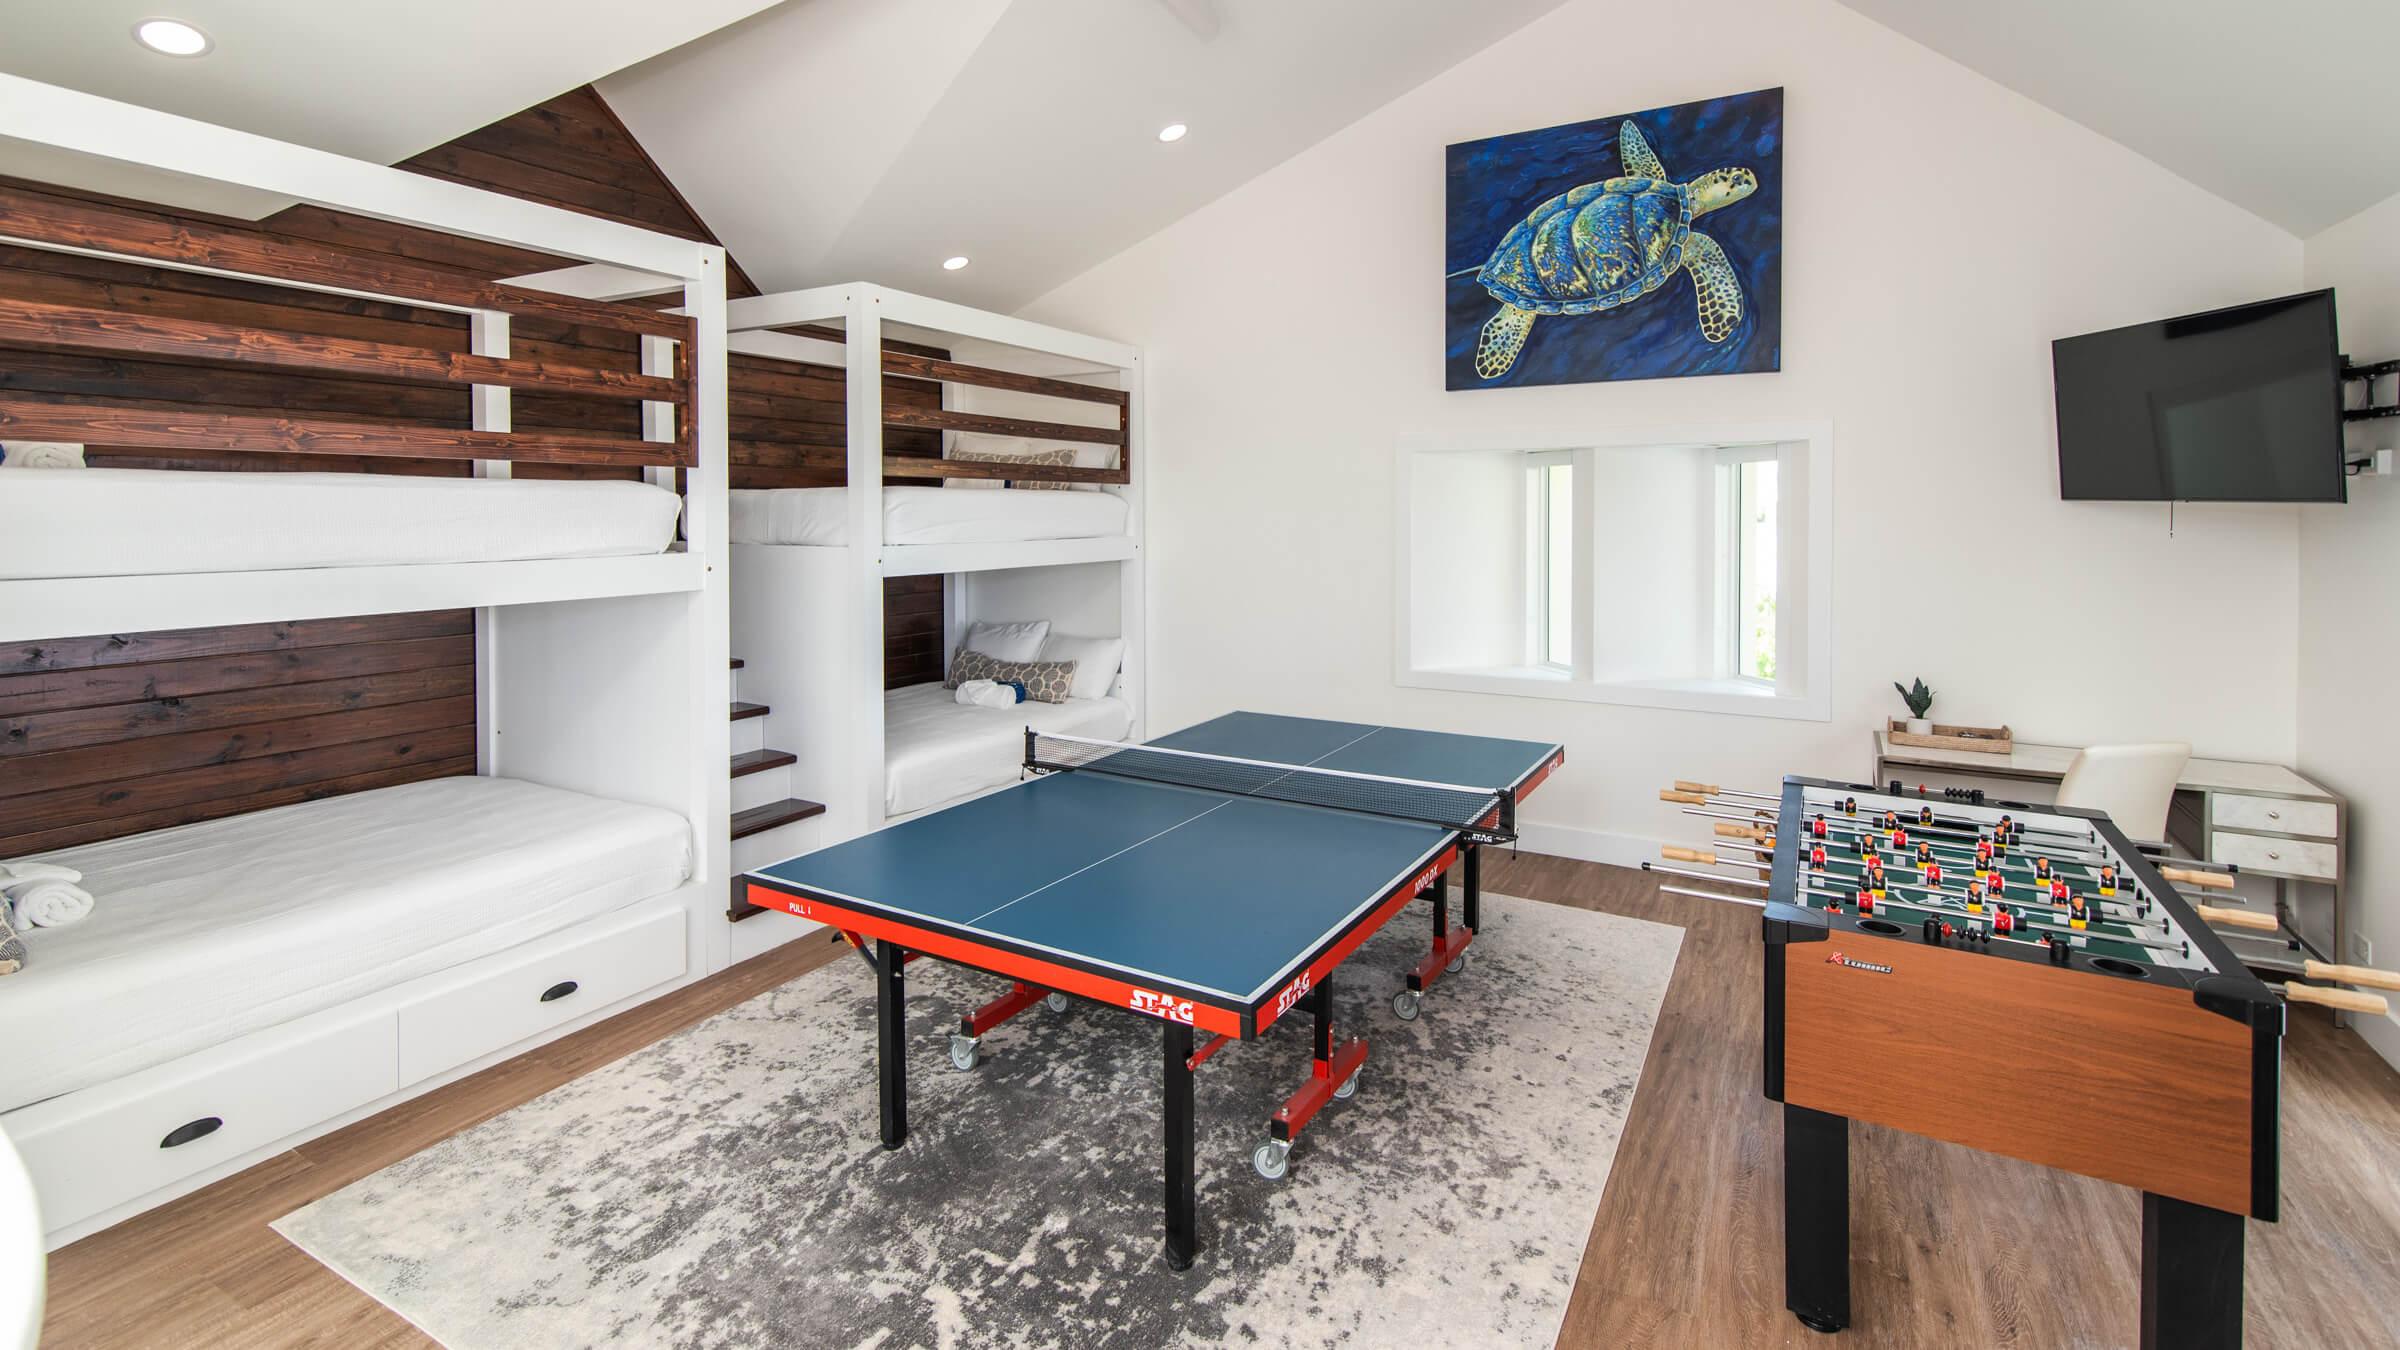 Seascape-Villa-Beach-Villa-Cayman-Islands-Grand-Cayman-Paradise-Kids-and-Teens-Bedroom-Bunk-Beds.jpg